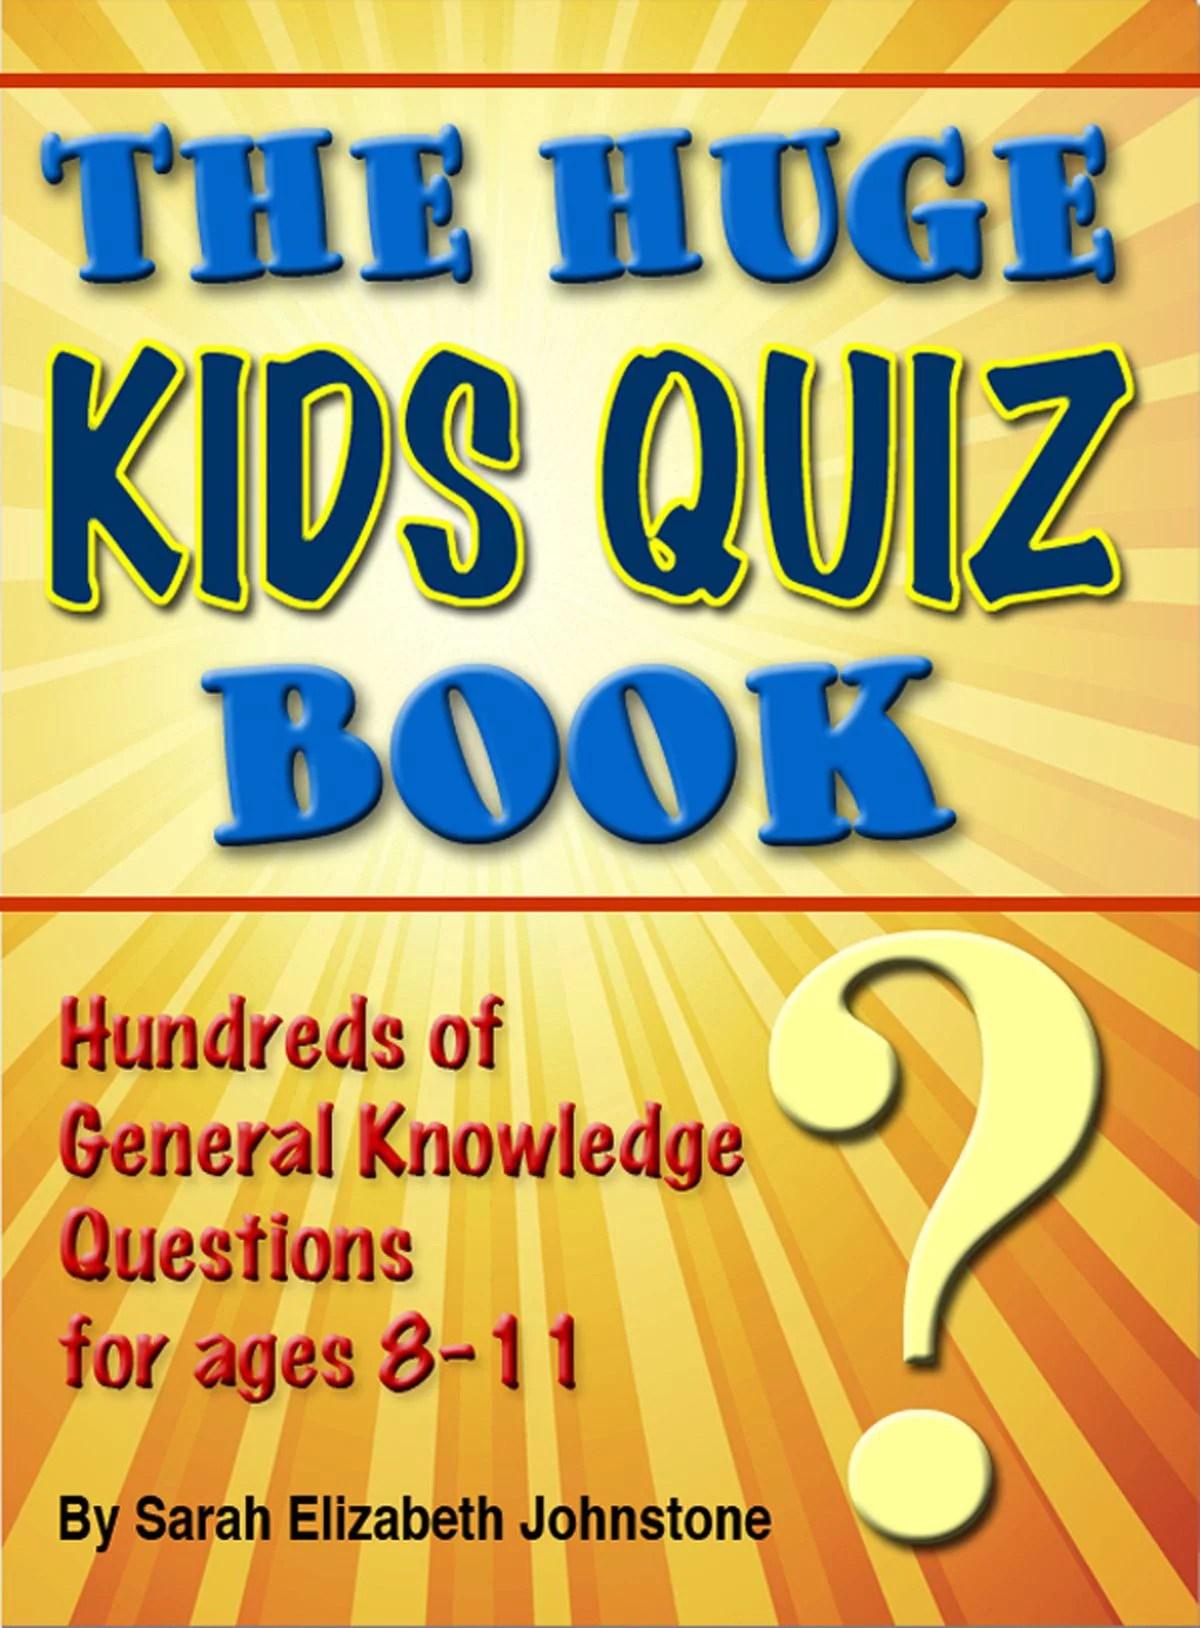 The Huge Kids Quiz Book Educational Mathematics